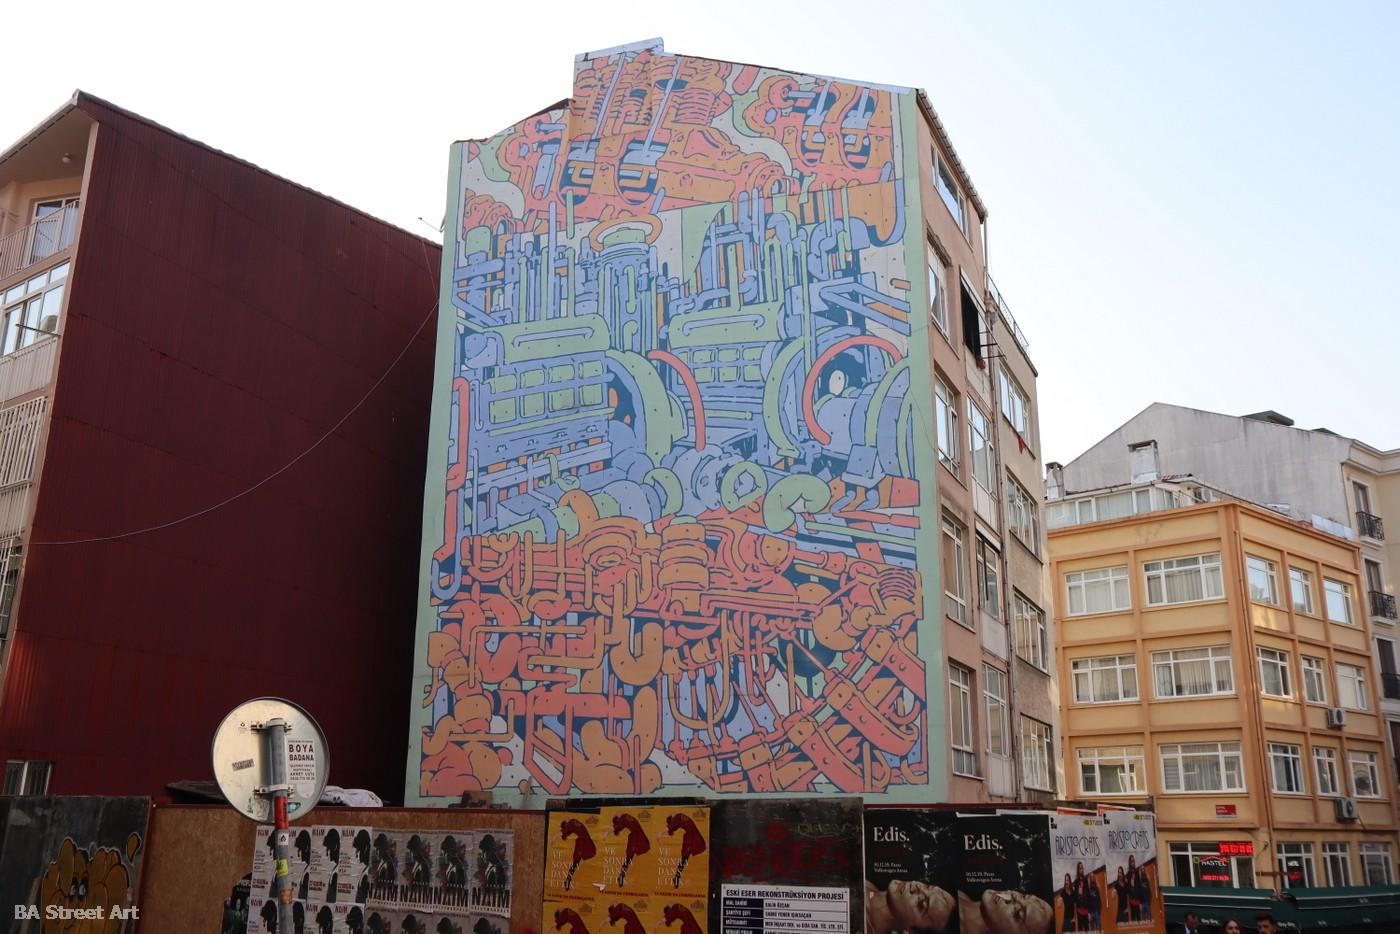 aryz mural istanbul turkey spain barcelona street artist buenosairesstreetart.com